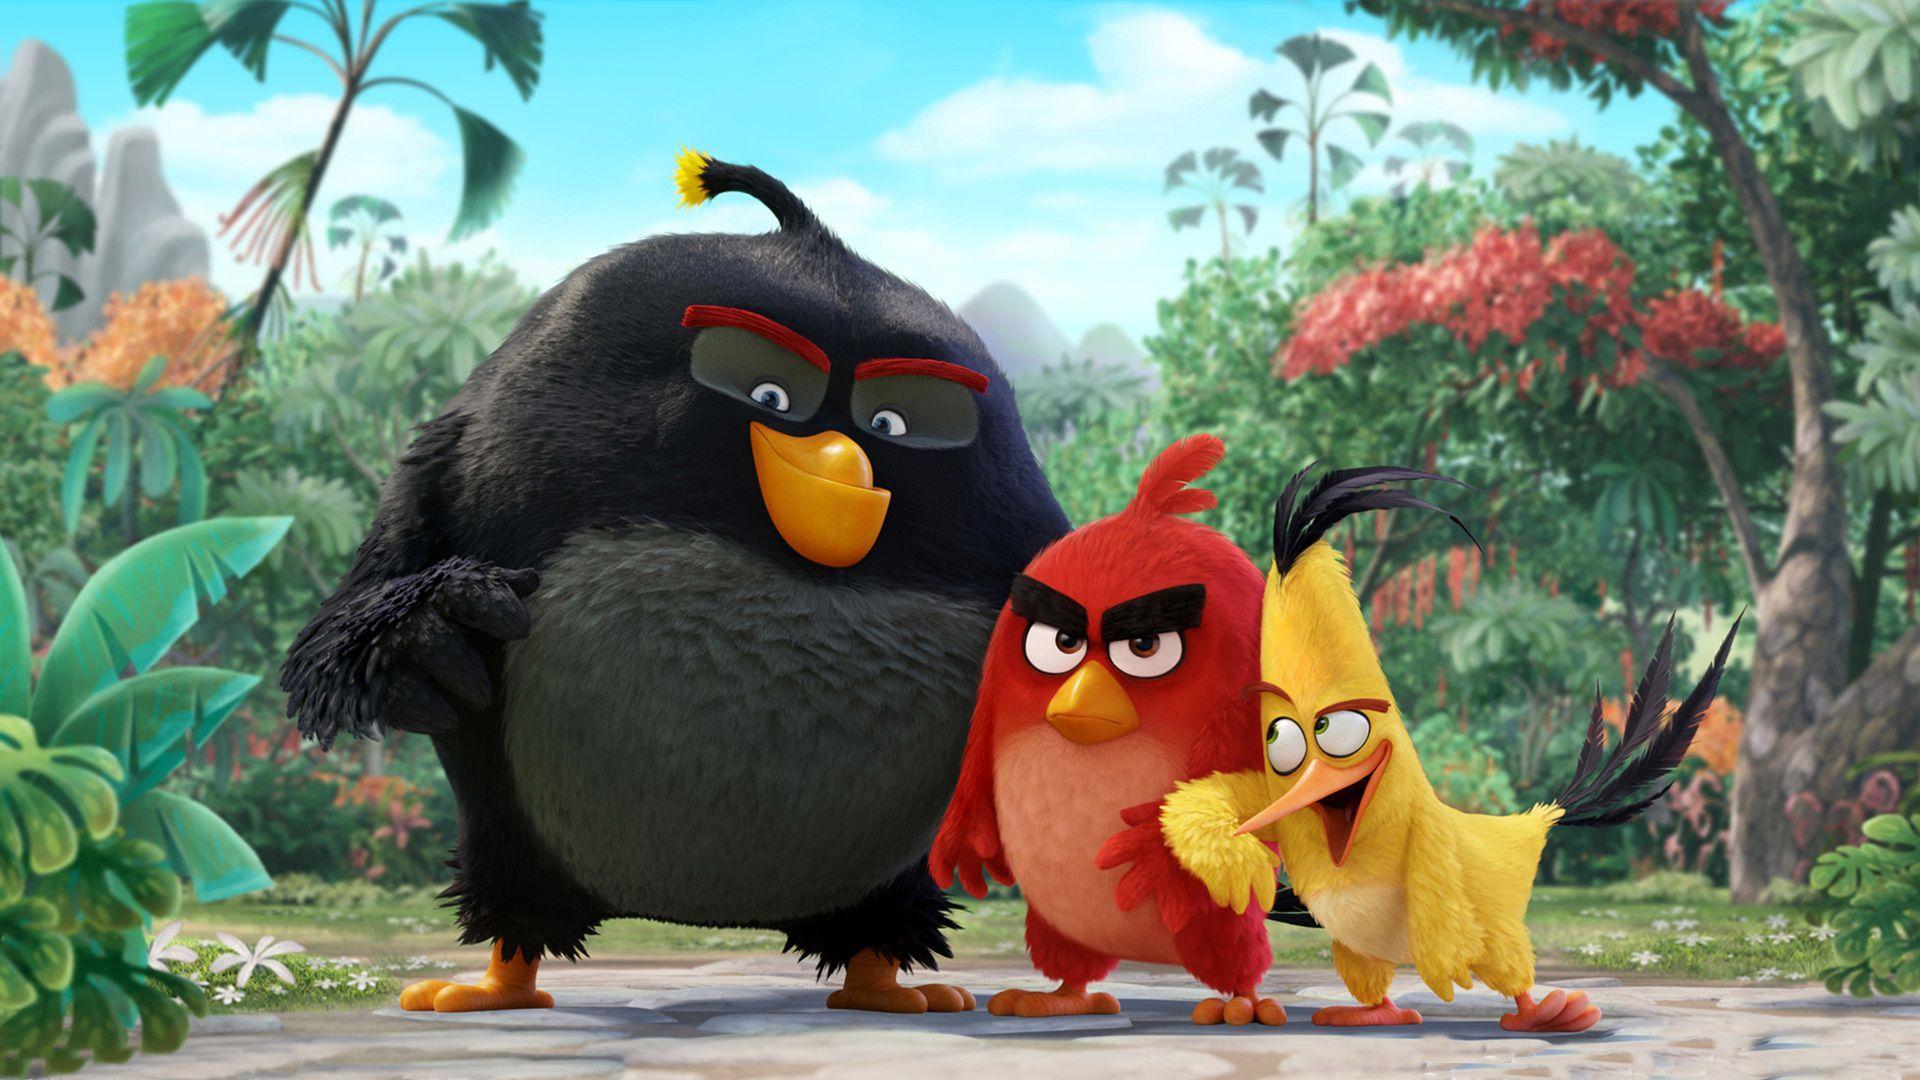 The Angry Birds Movie 2016 Flickfeast